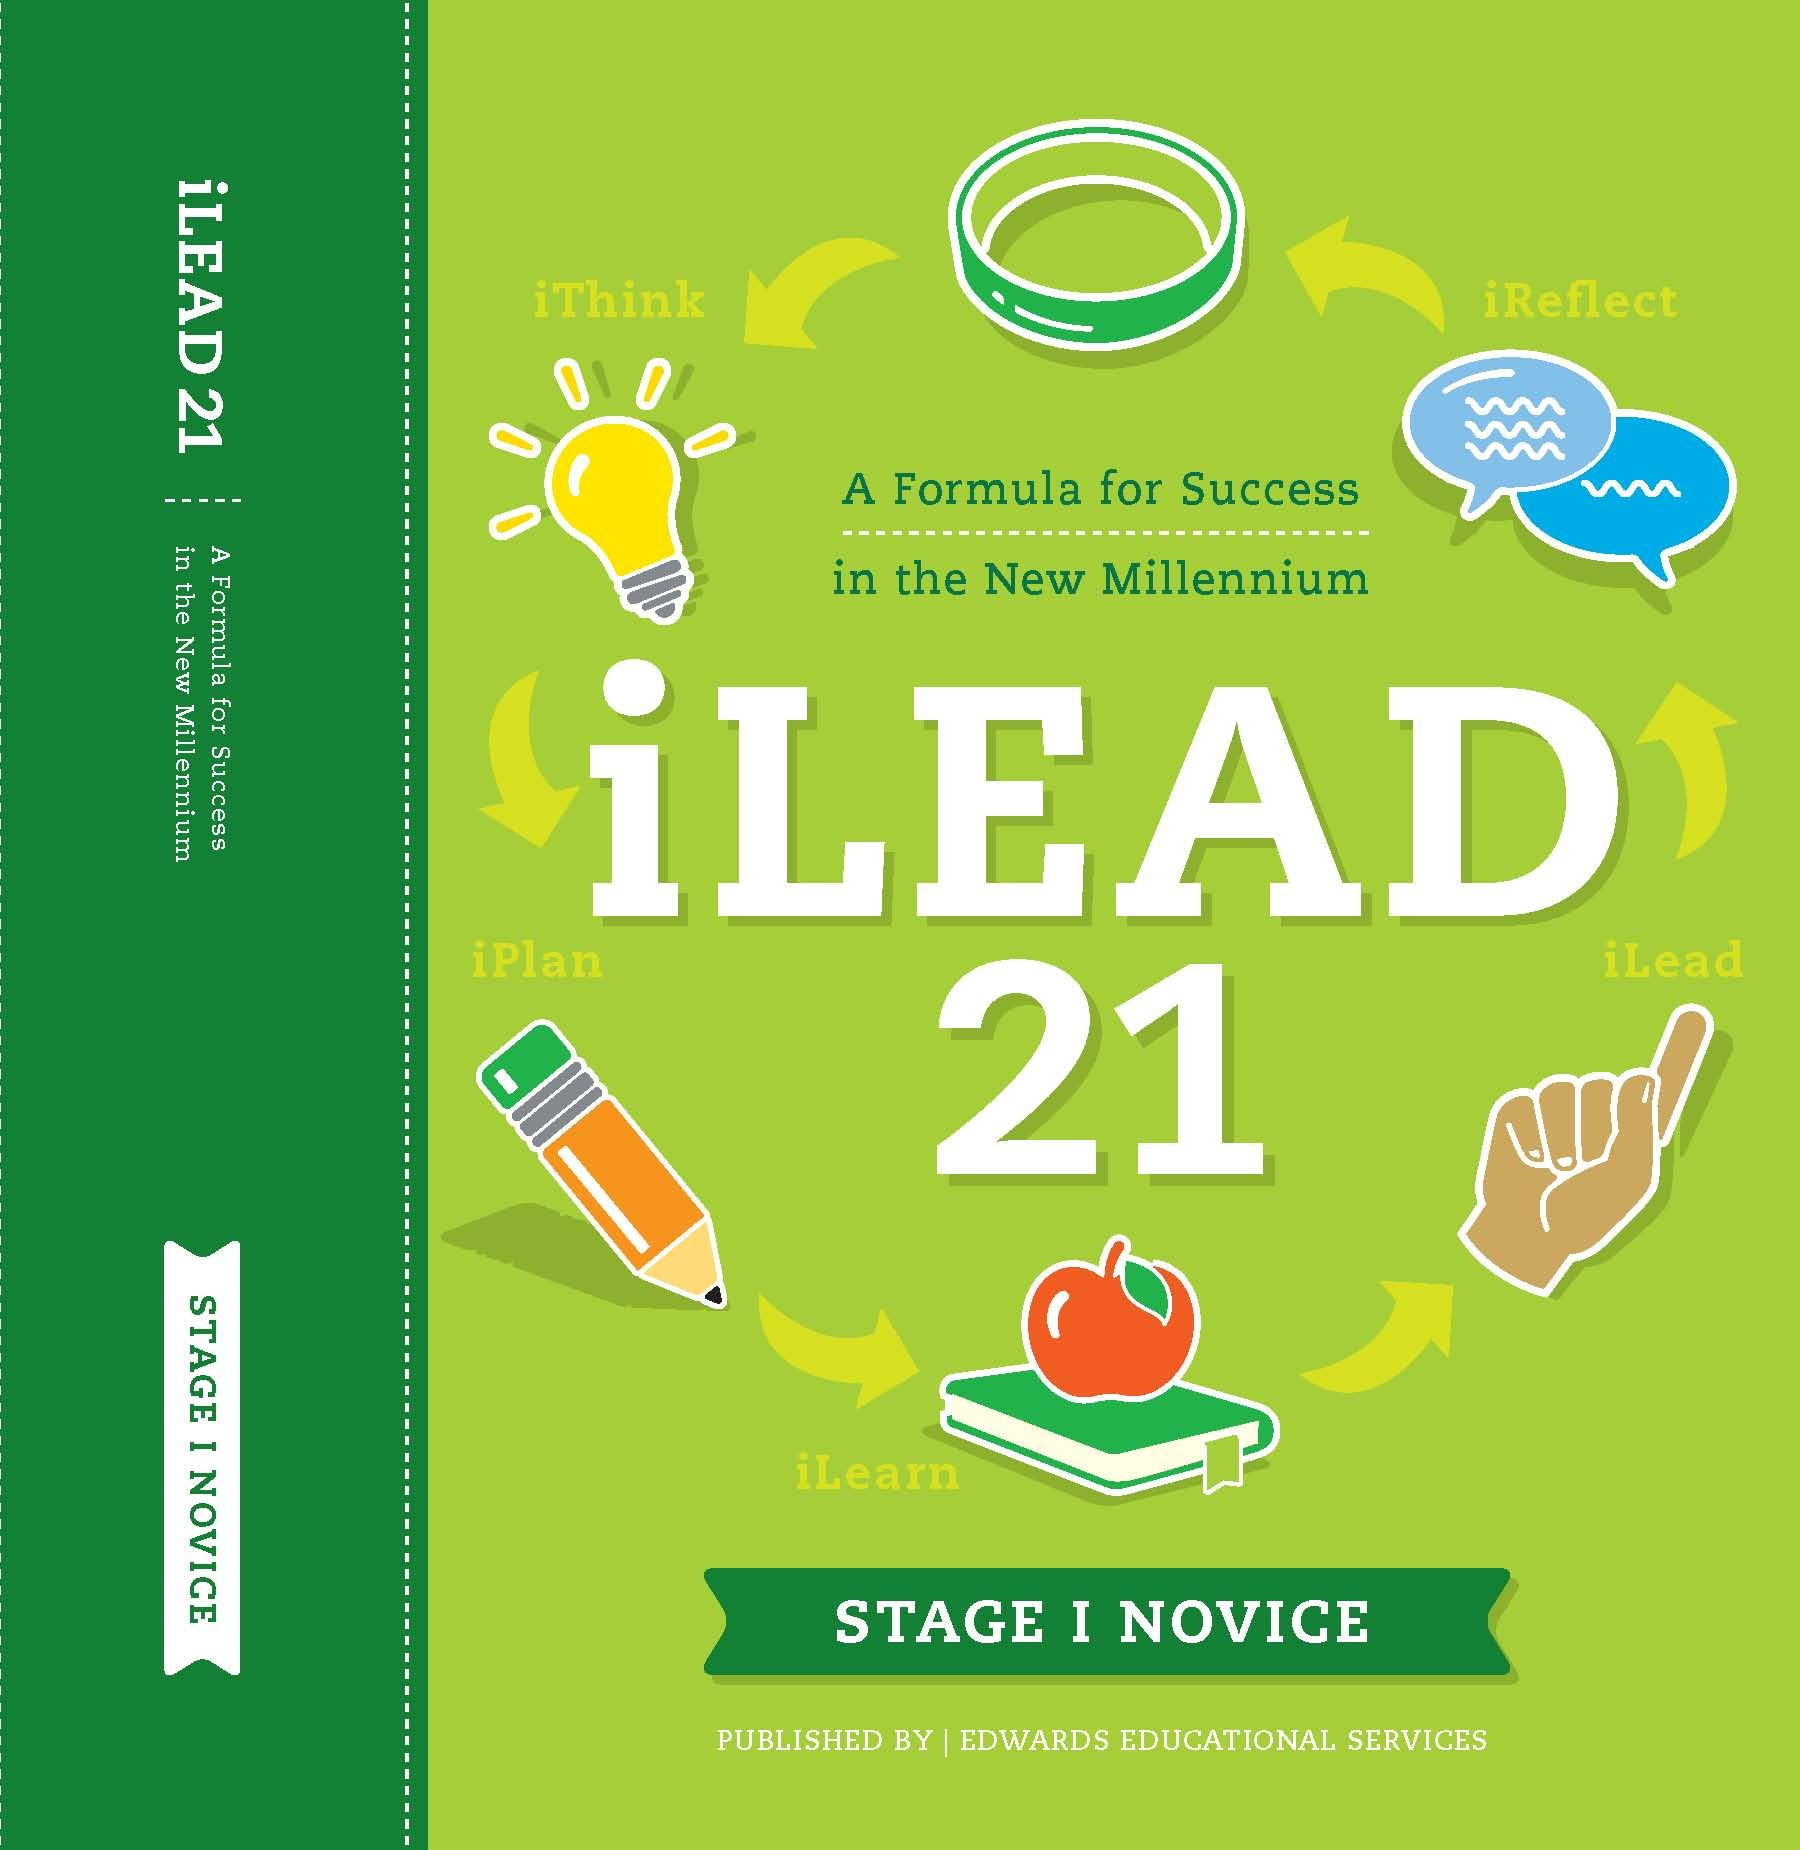 iLead21 Student Leadership Development Experience | What ...